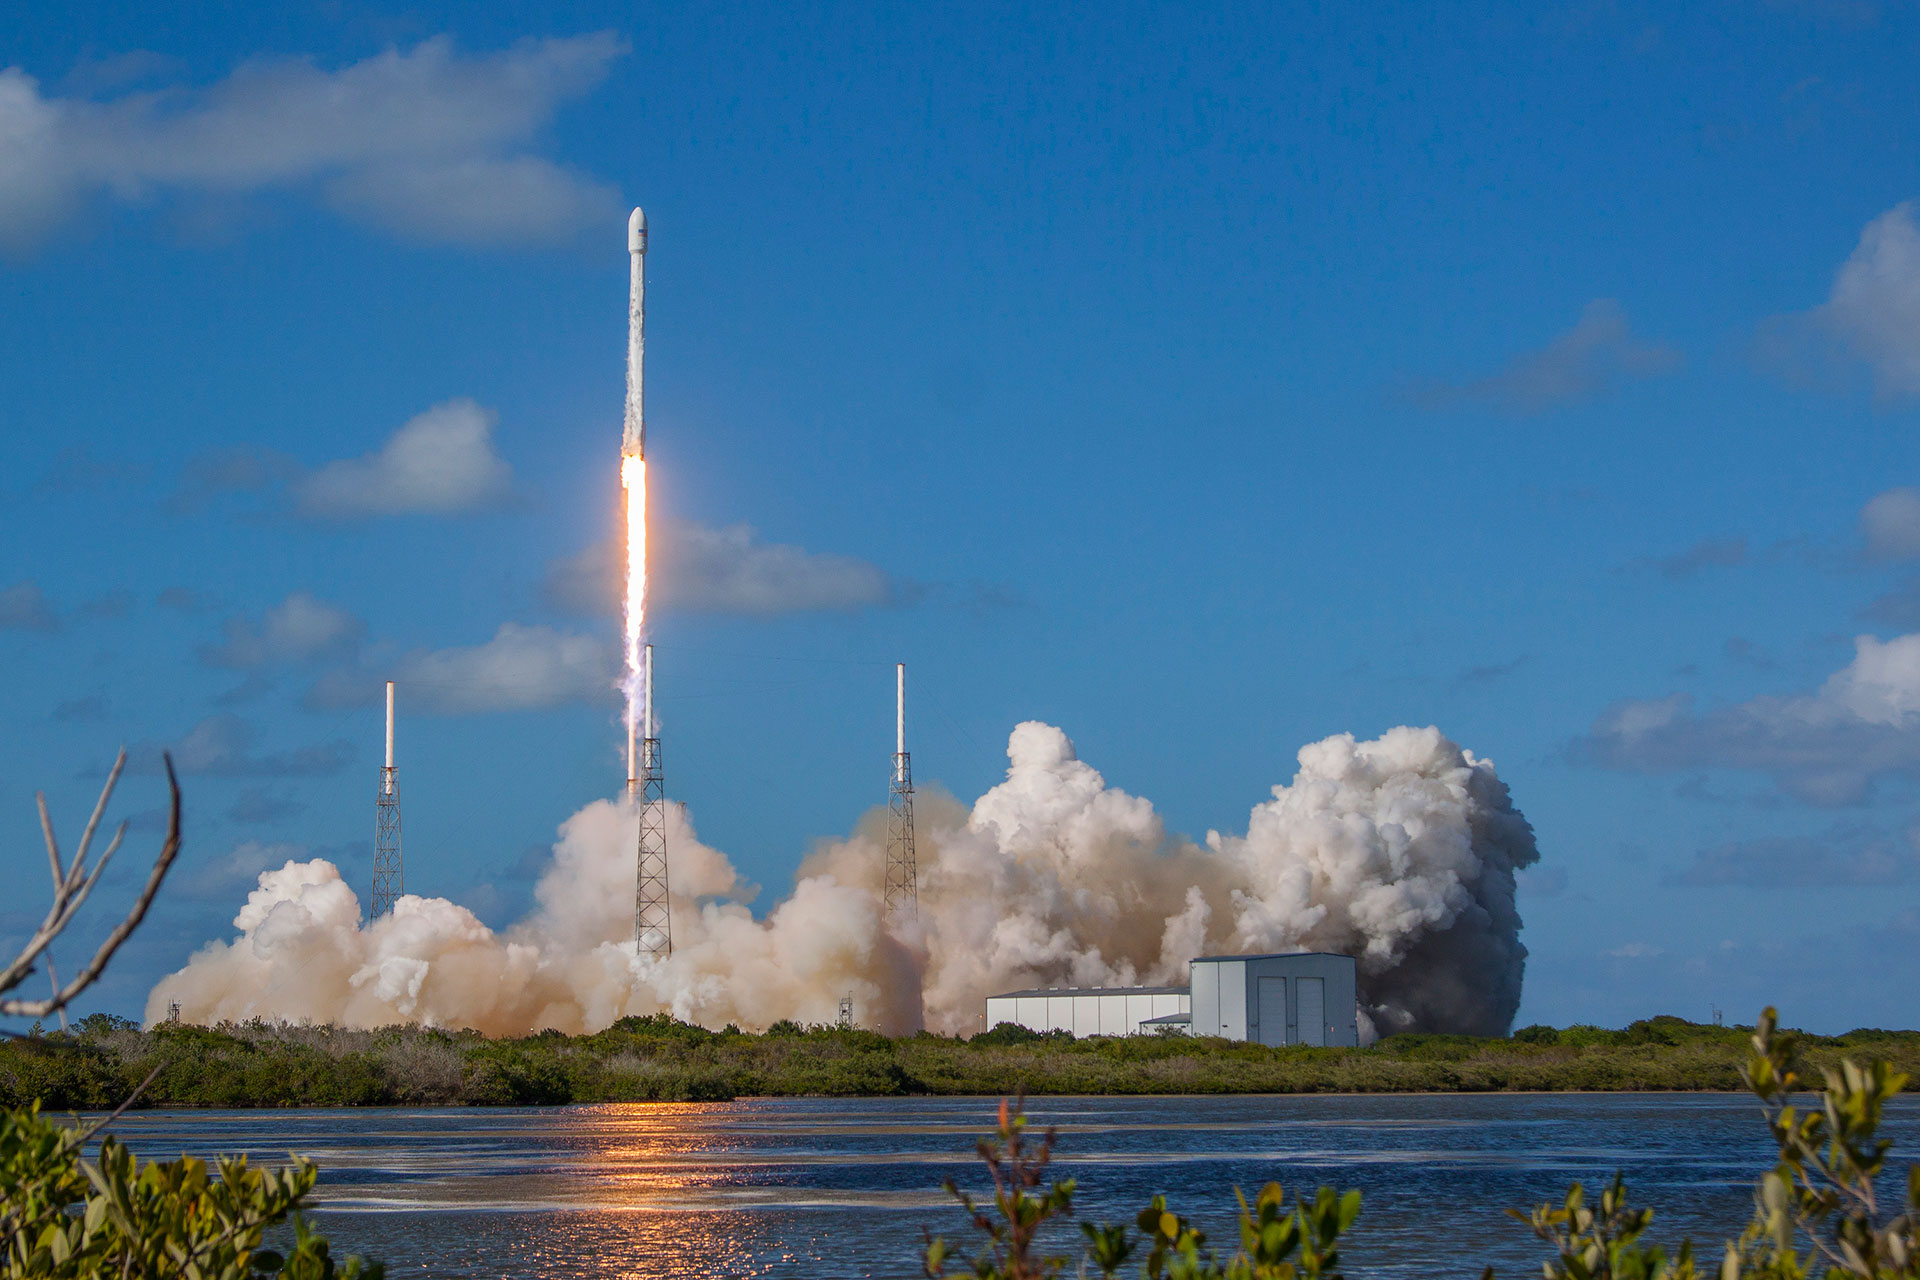 spacex thaicom 8 rocket launch